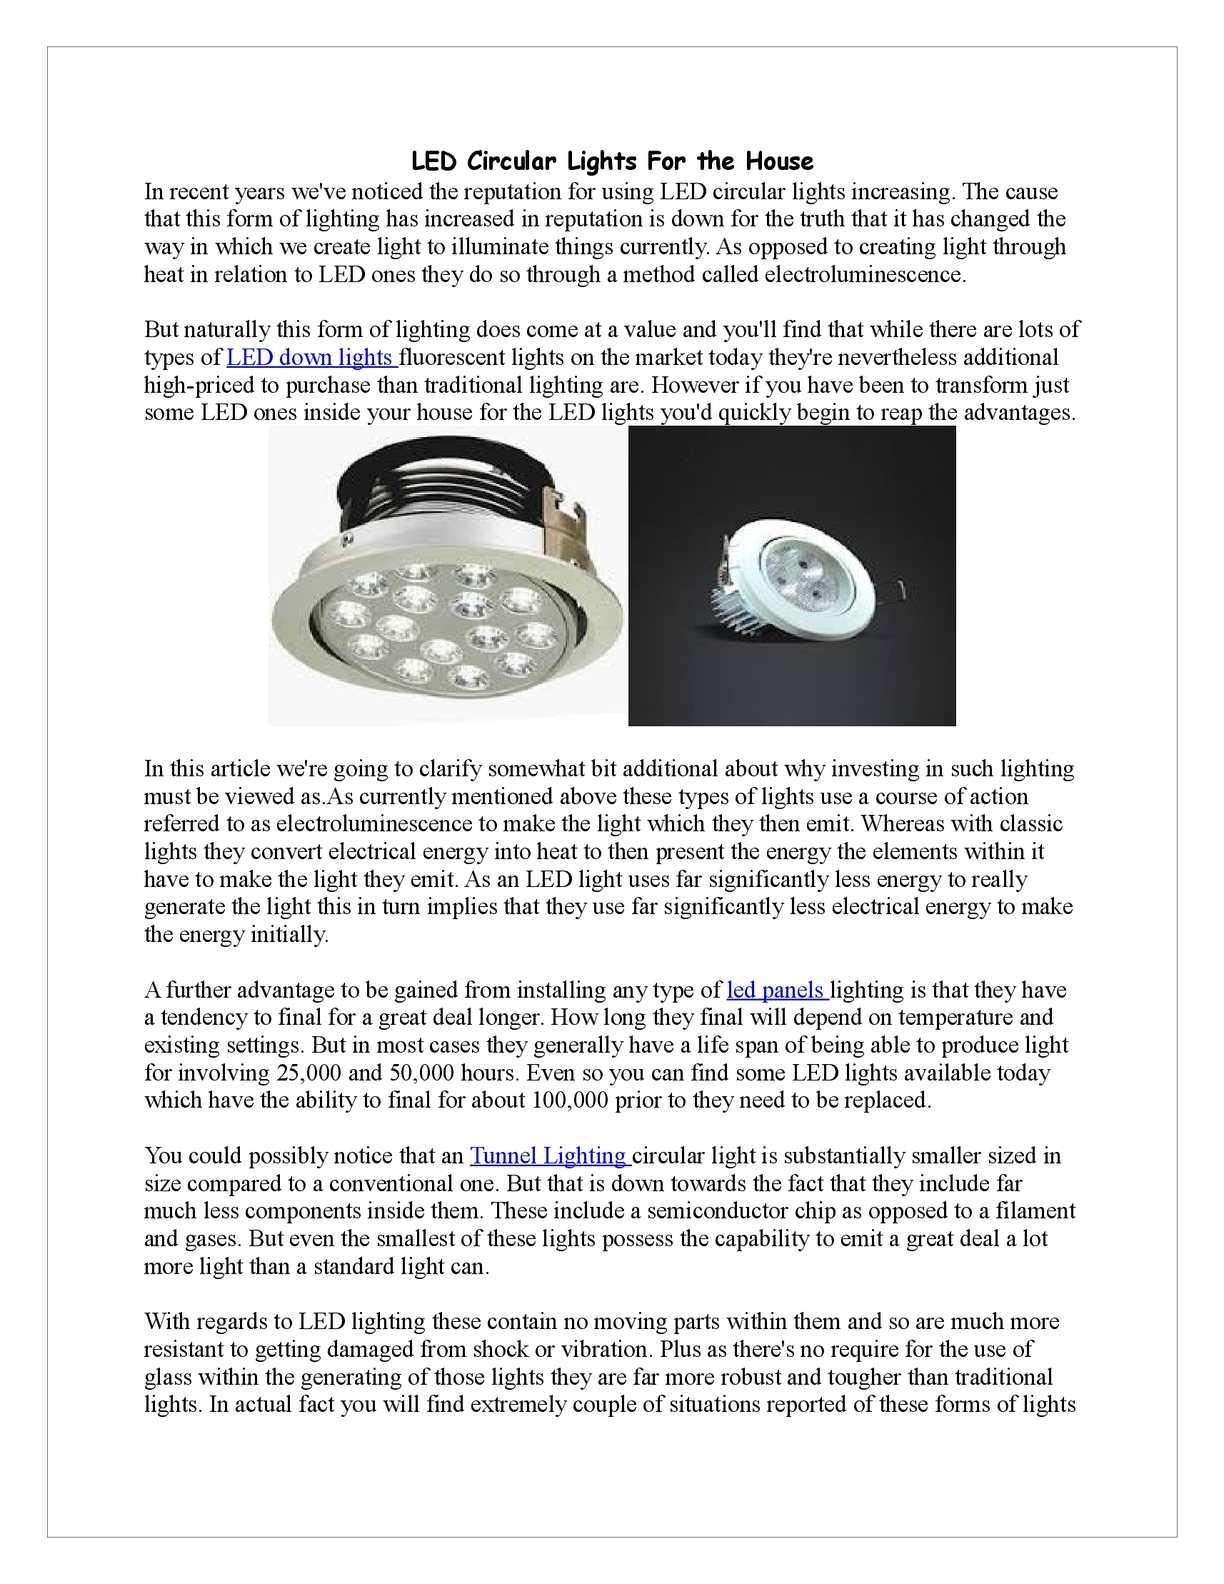 Calaméo - LED Circular Lights For the House